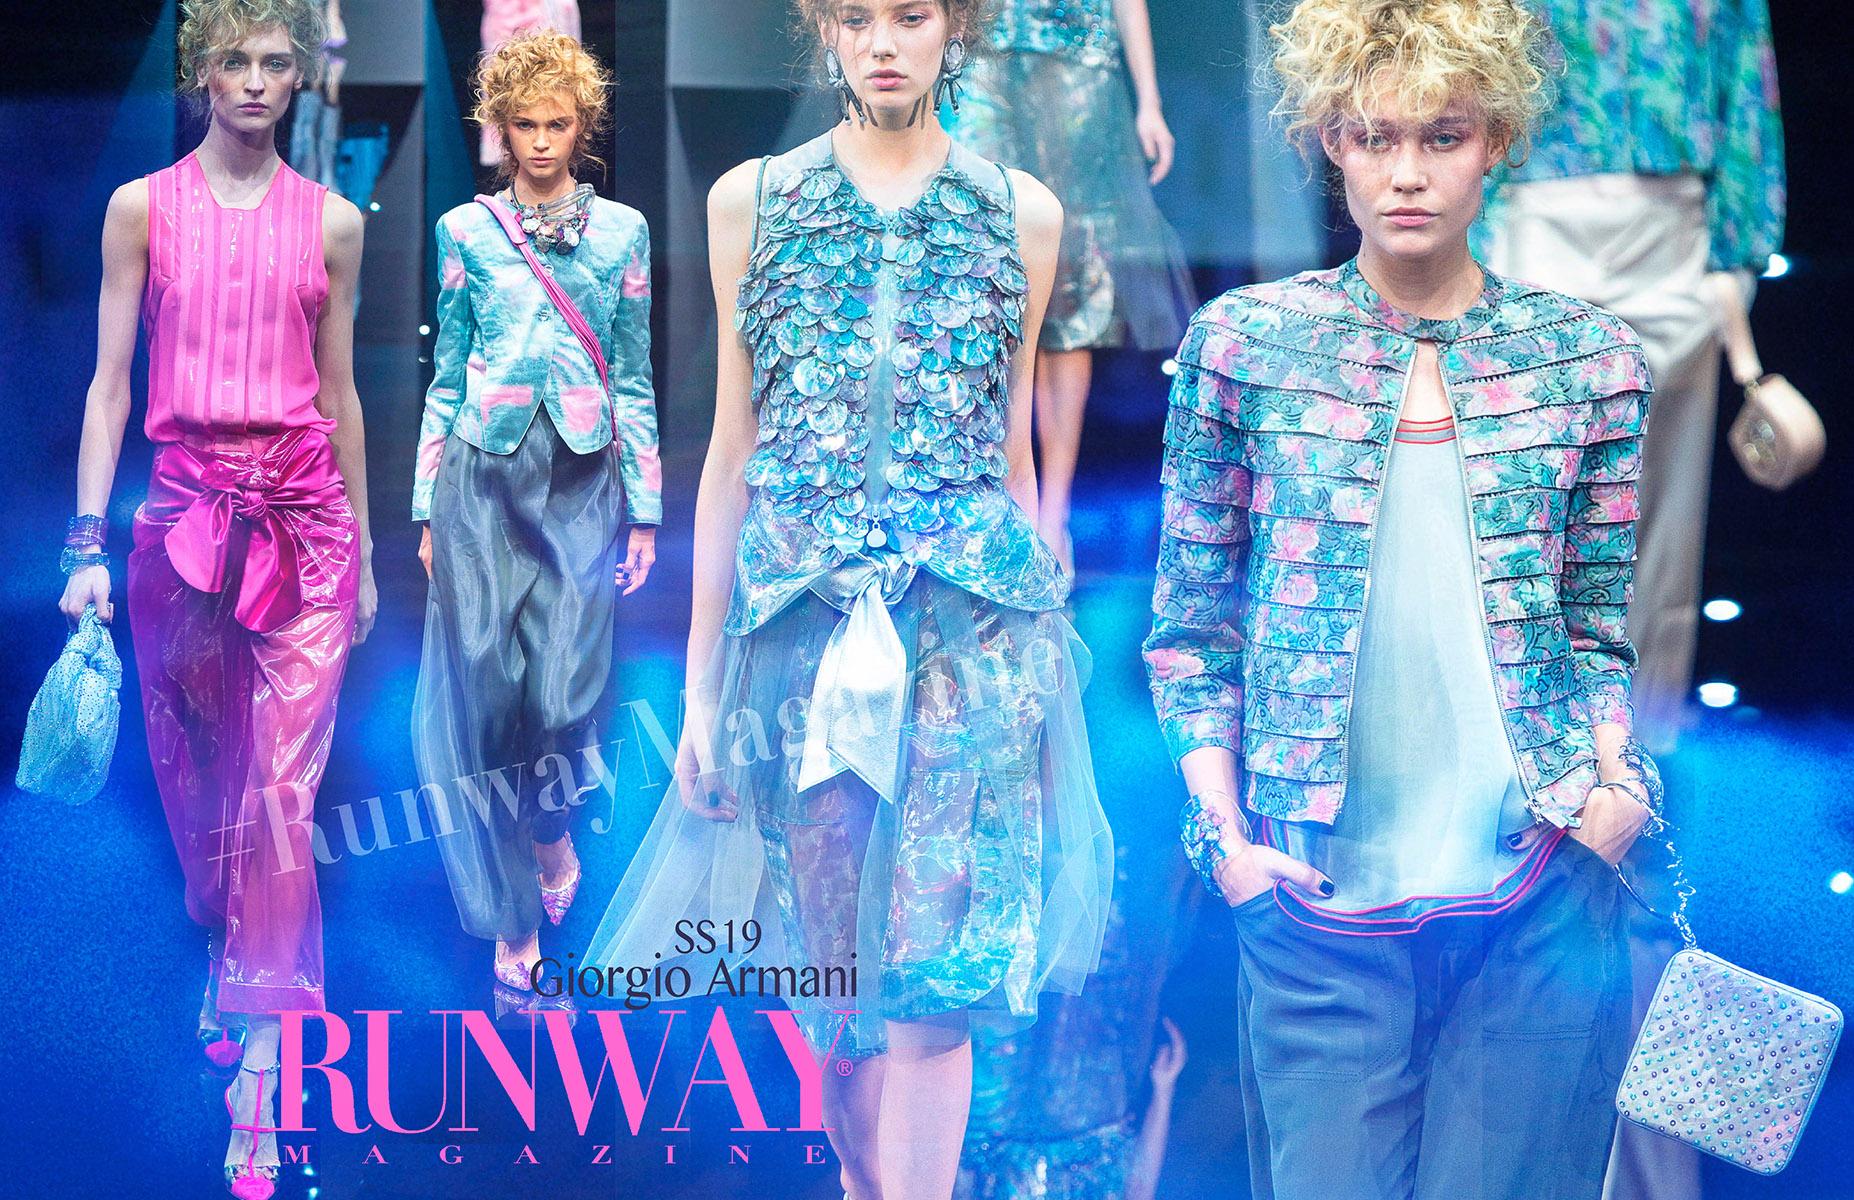 Giorgio Armani,TENDANCES DE COULEURS, Guillaumette Duplaix, Runway Magazine